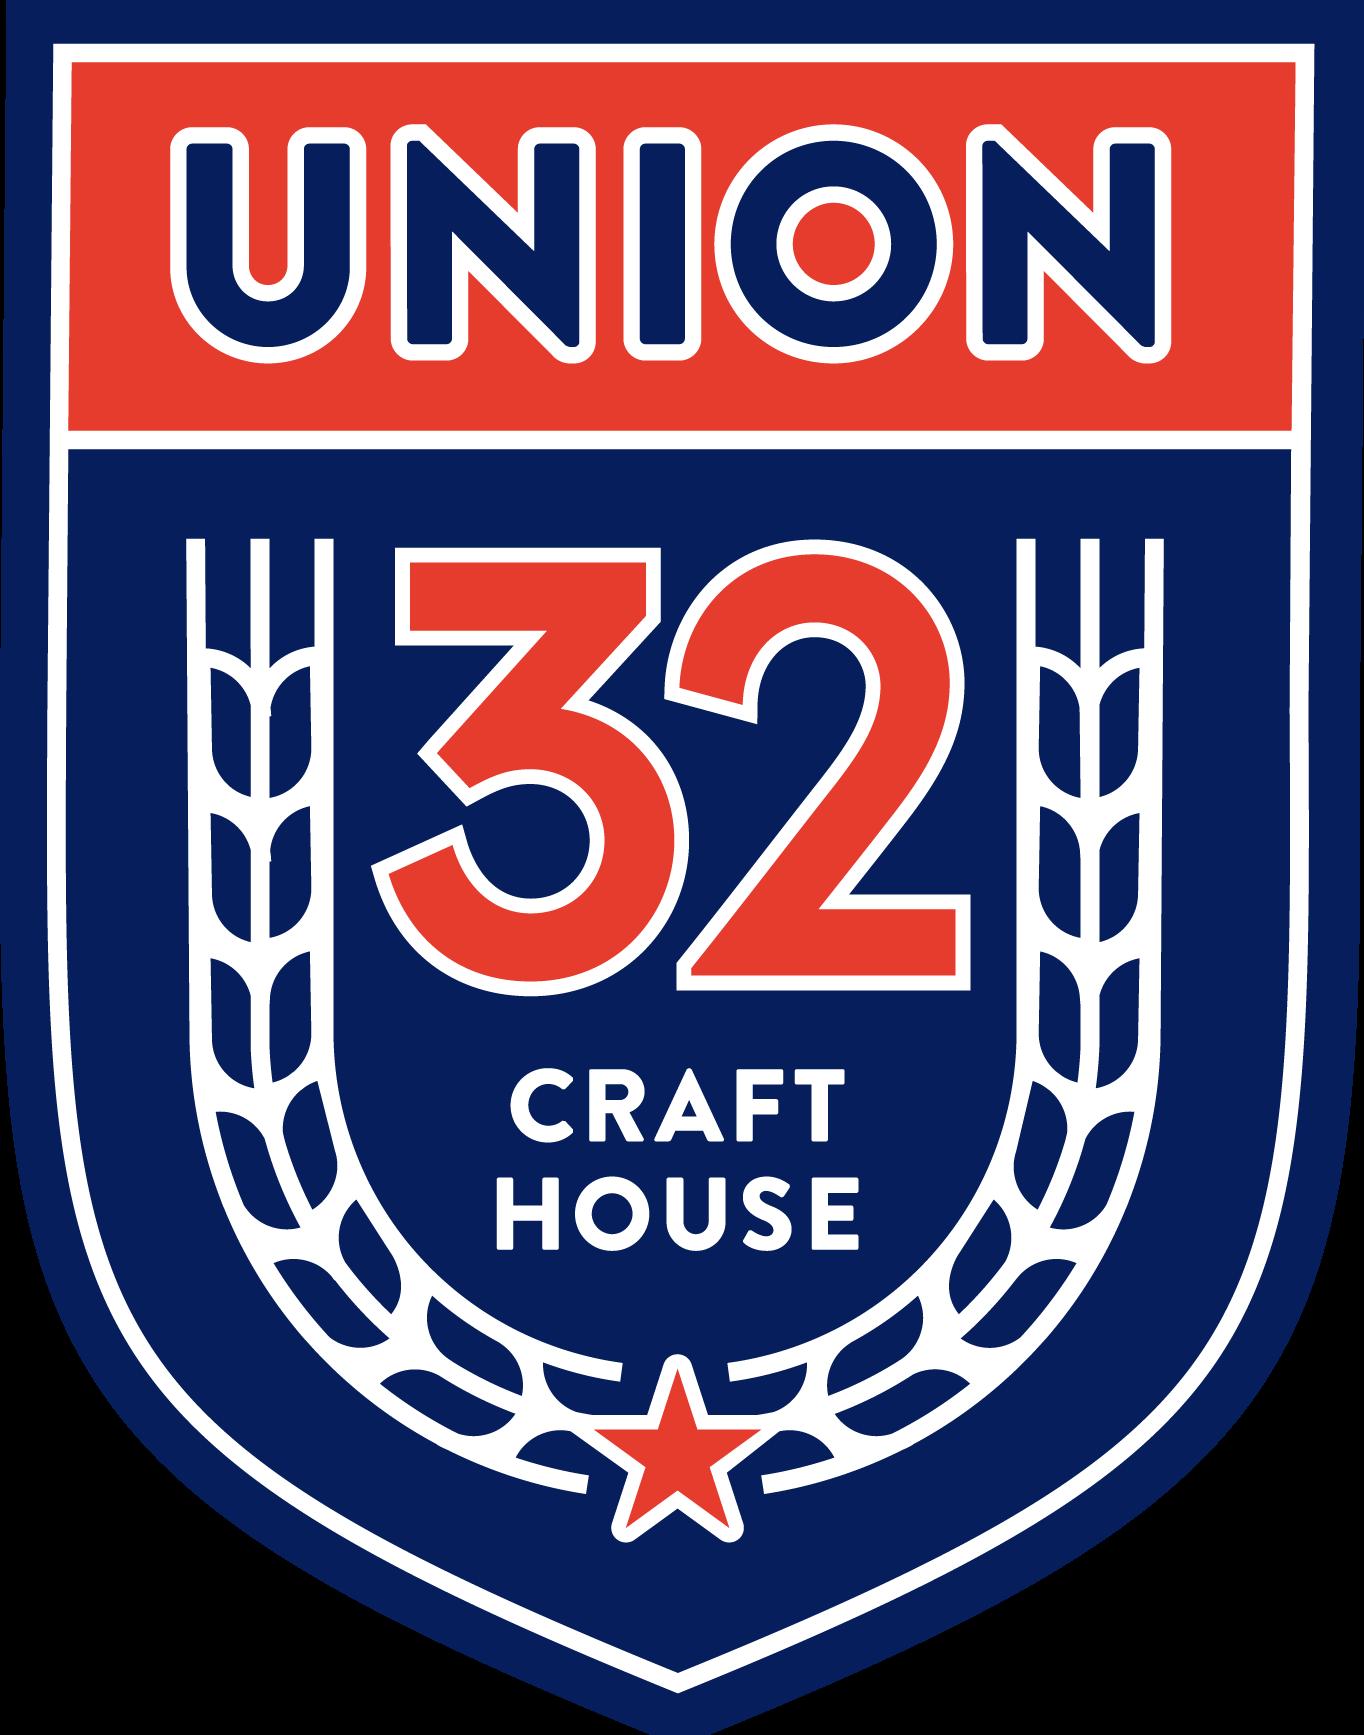 Union 32